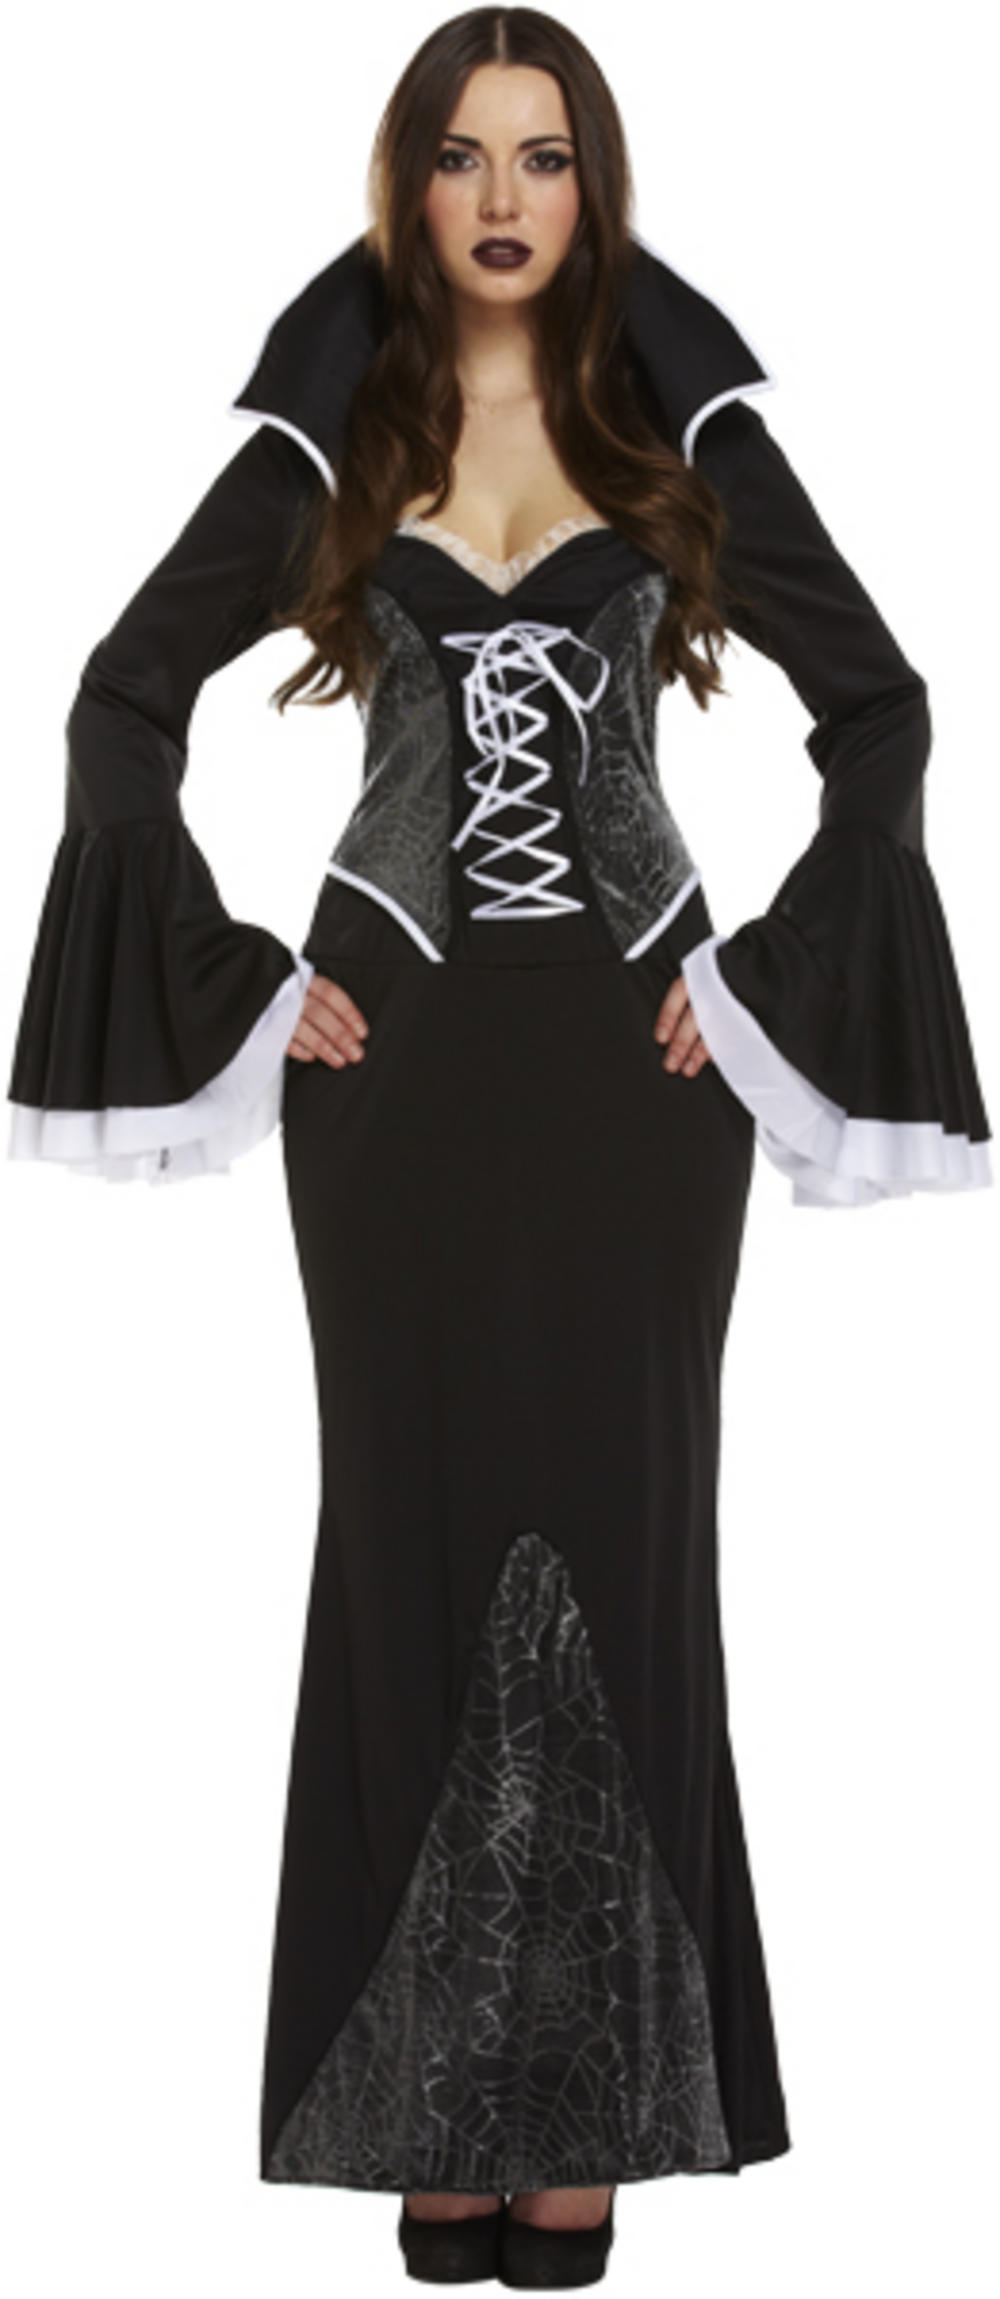 Ladies Web Vampiress Costume